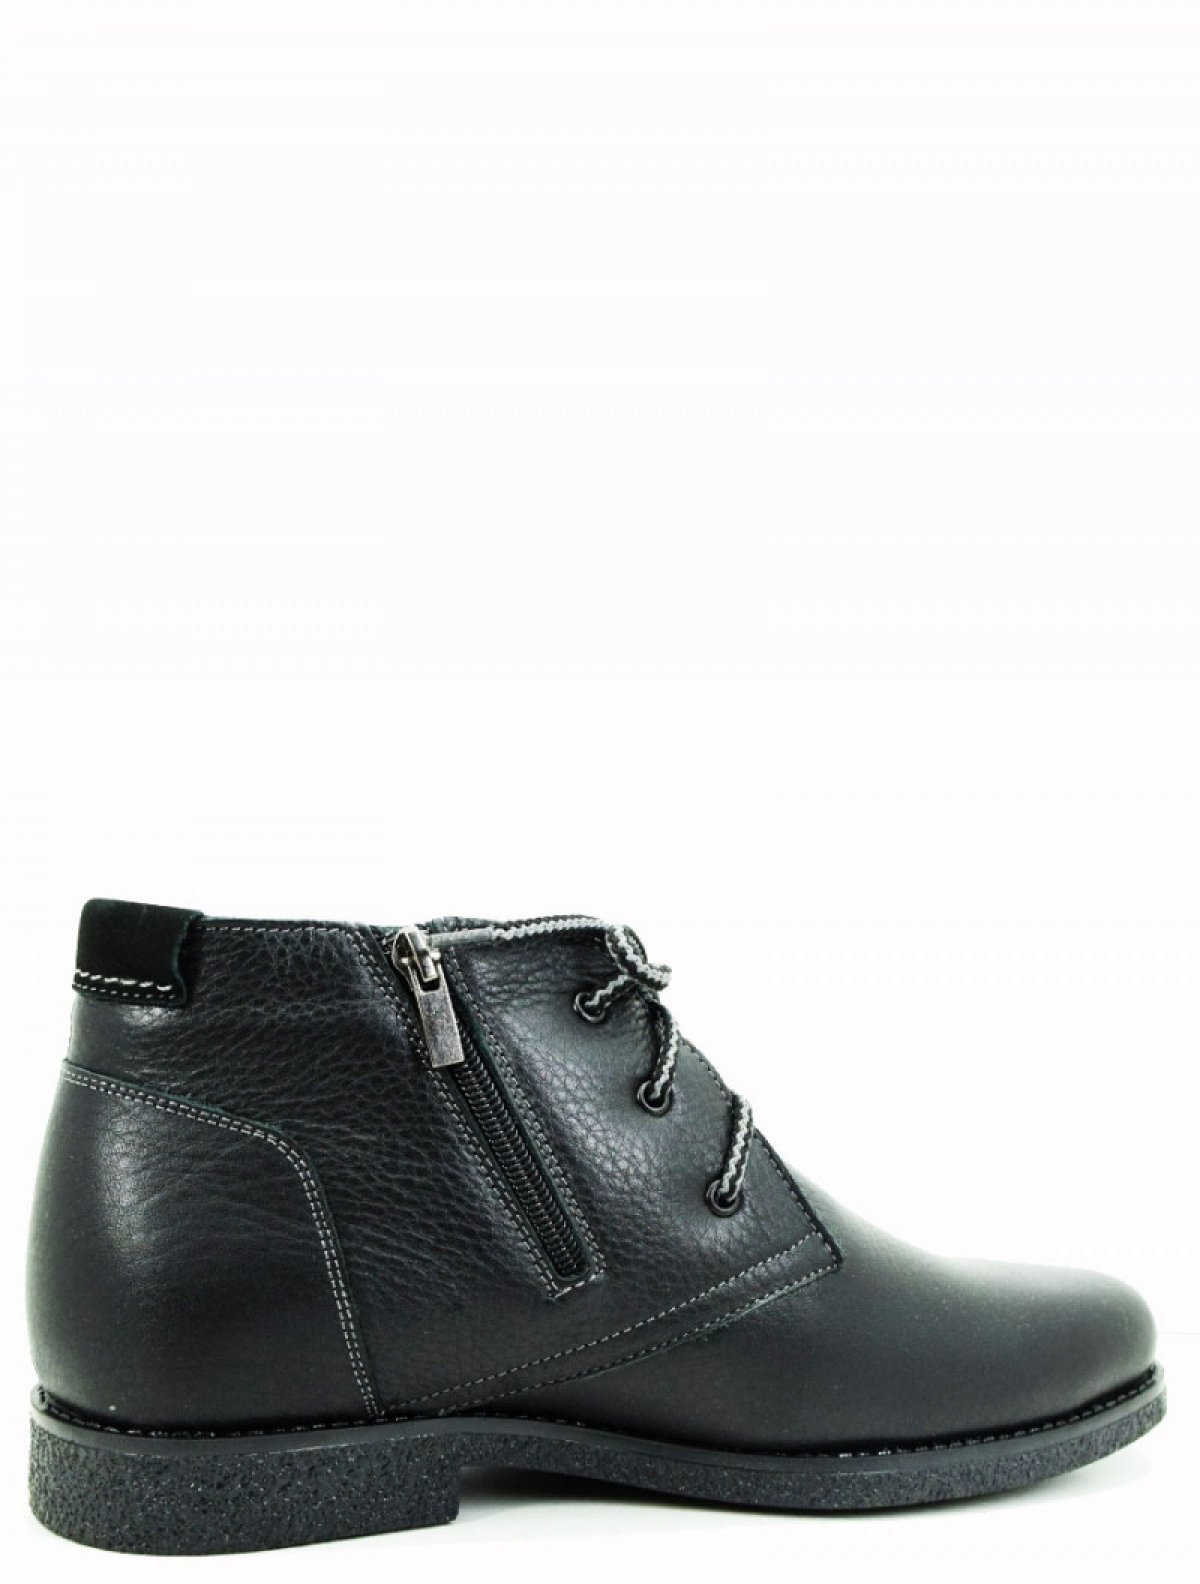 Baratto 1-608-113-2 мужские ботинки